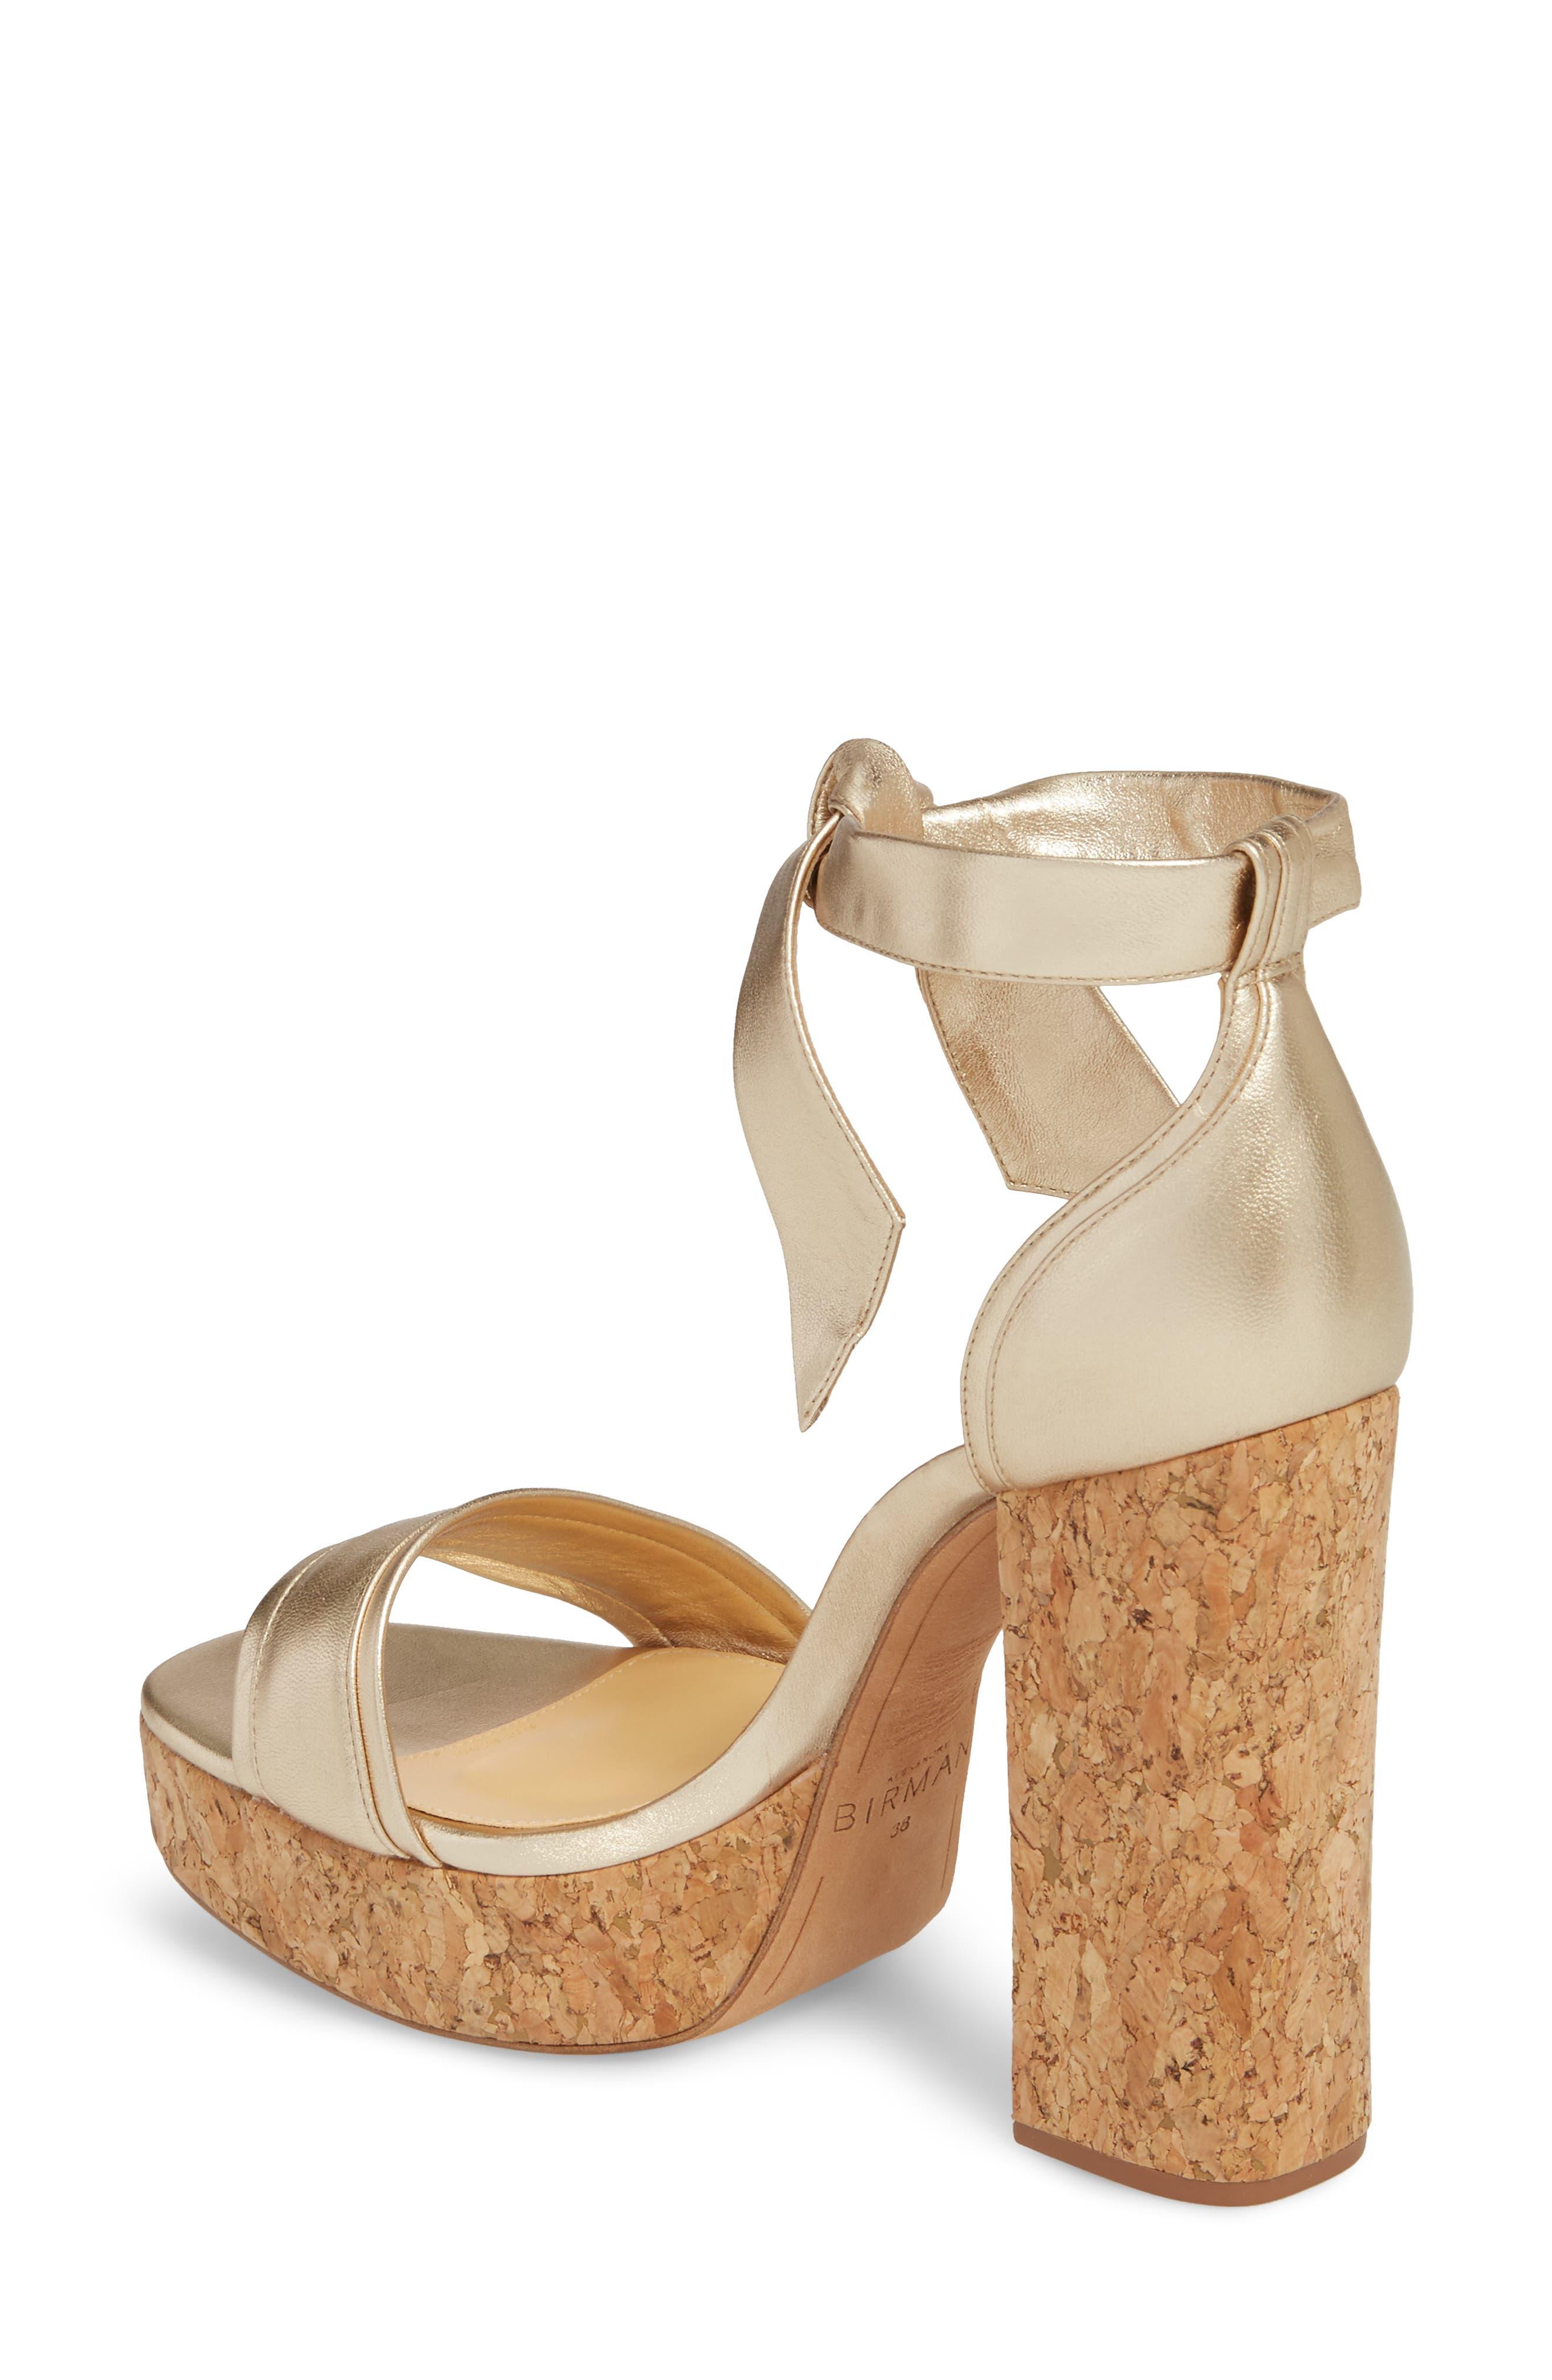 Celine Ankle Tie Platform Sandal,                             Alternate thumbnail 2, color,                             Gold